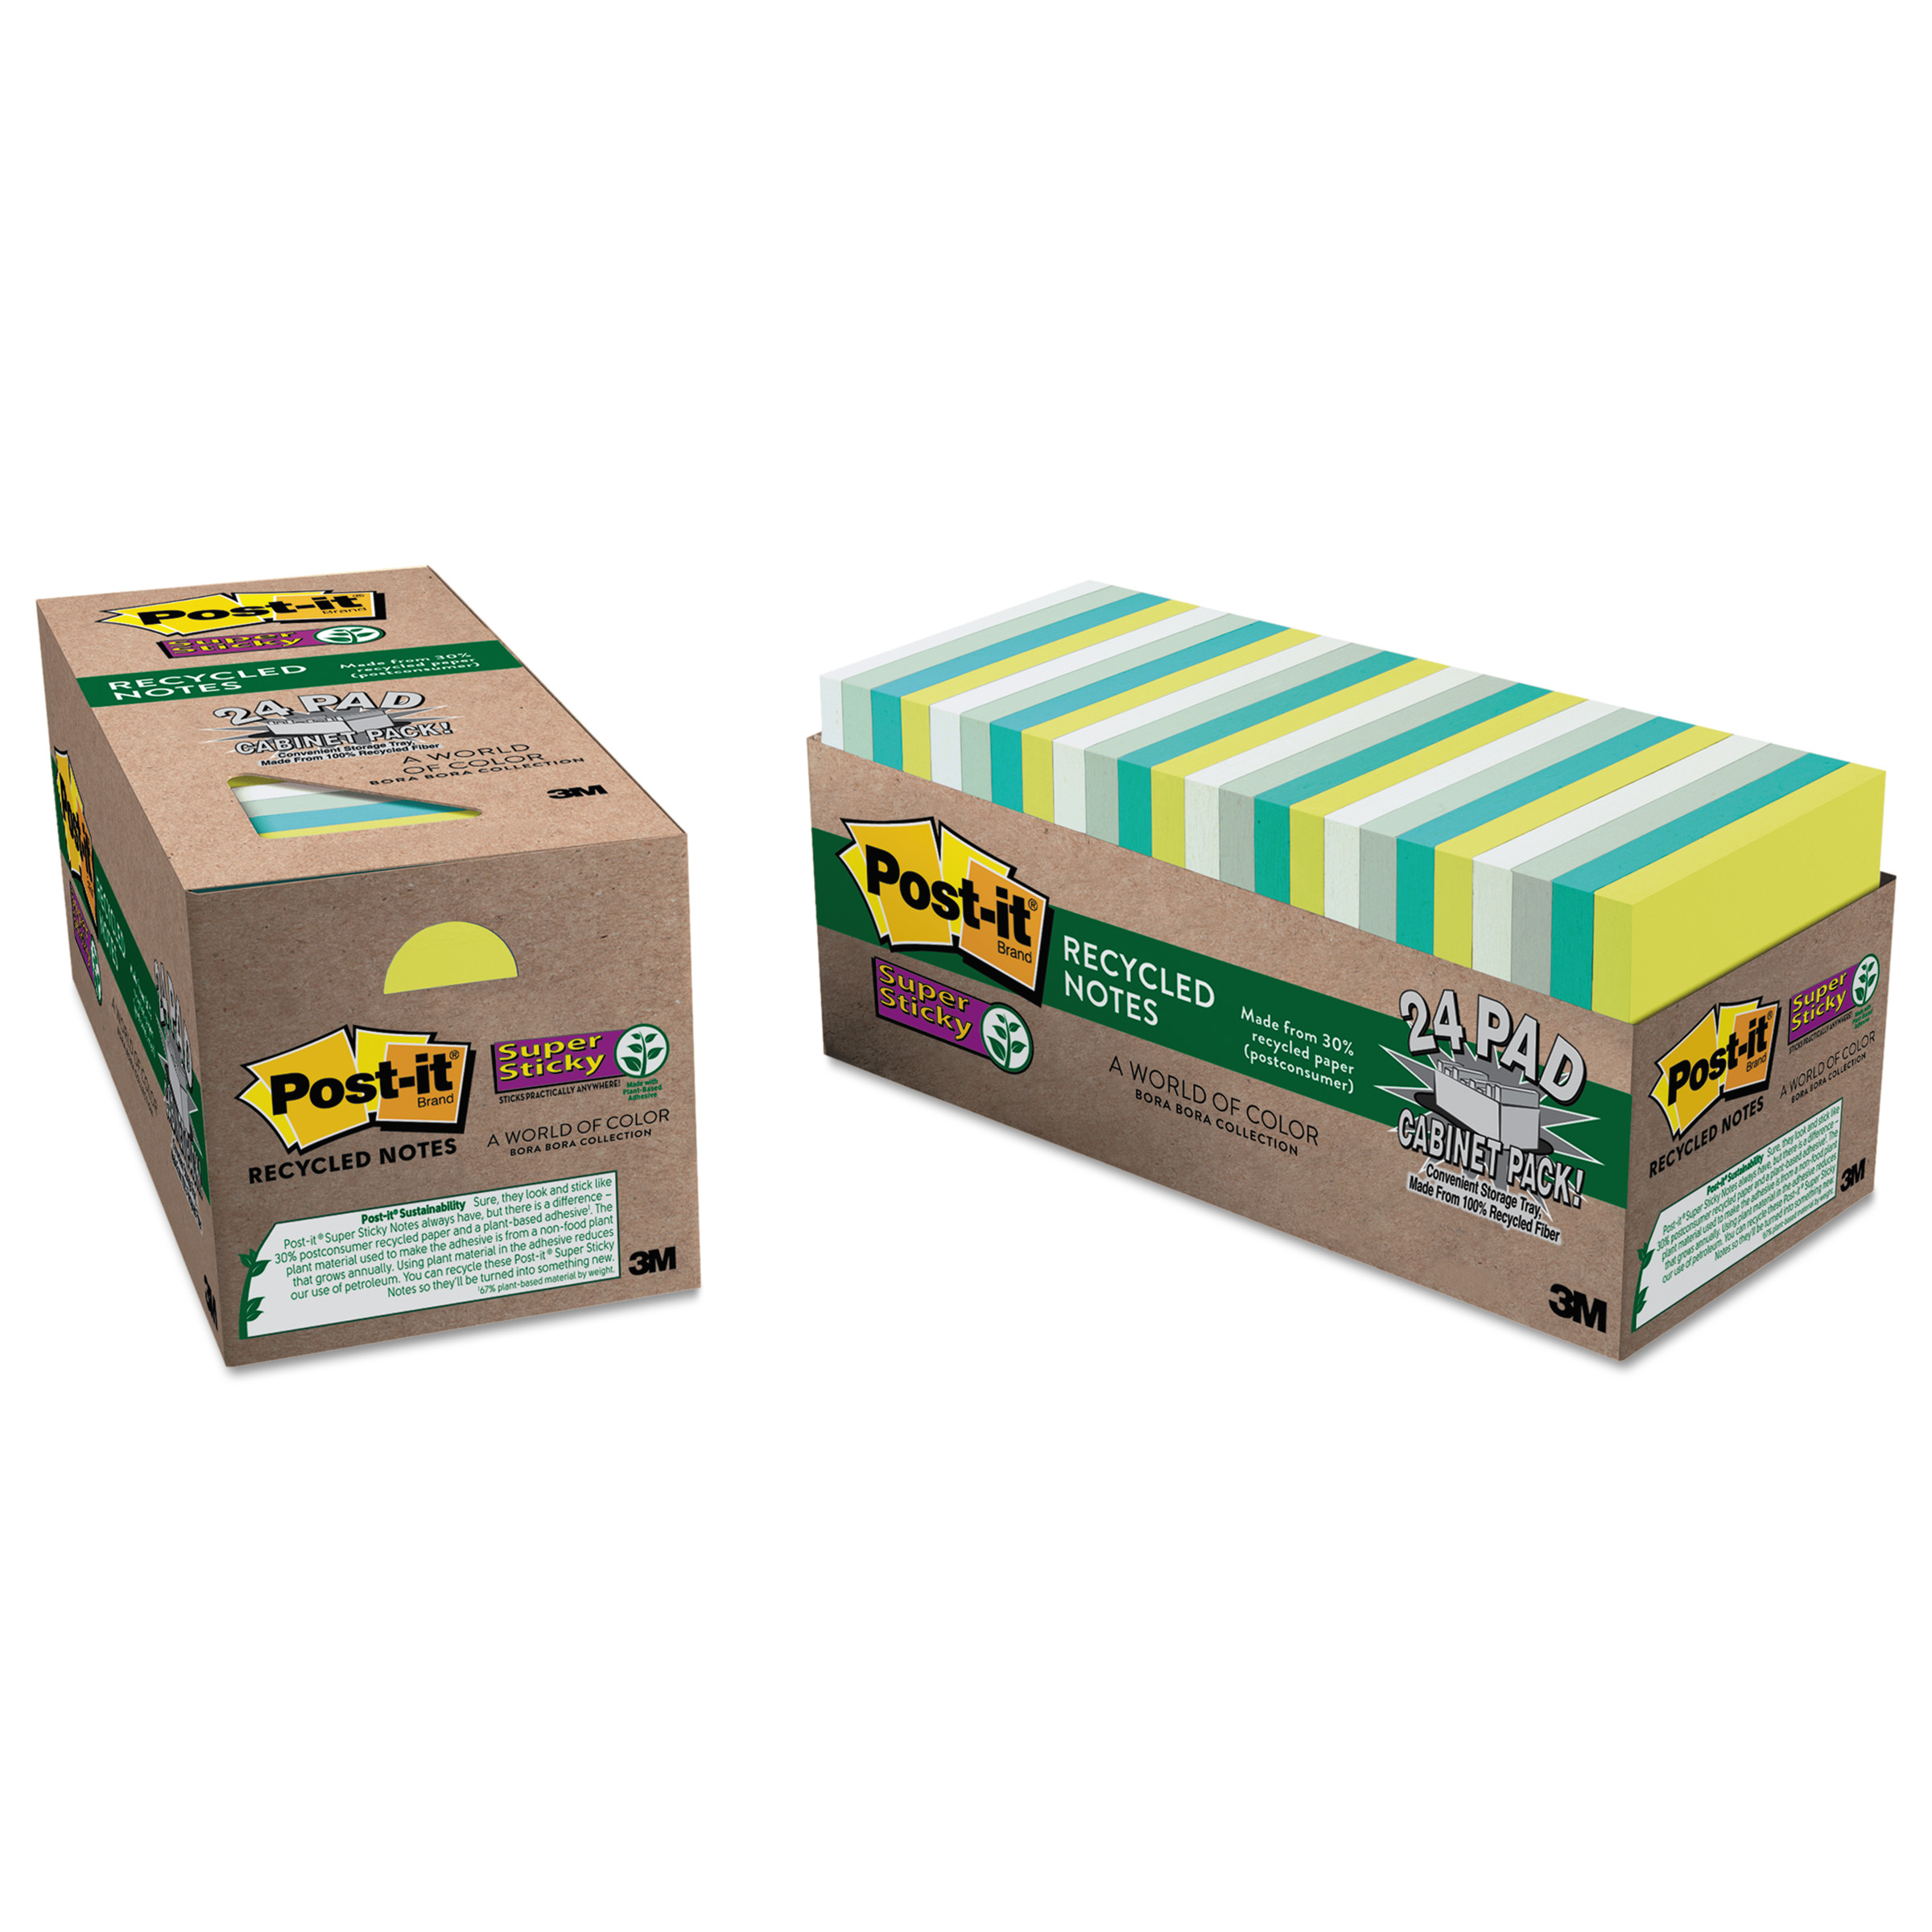 Post-it Super Sticky Bora Bora Notes Cabinet Pk, Assorted, 24 / Pack (Quantity)